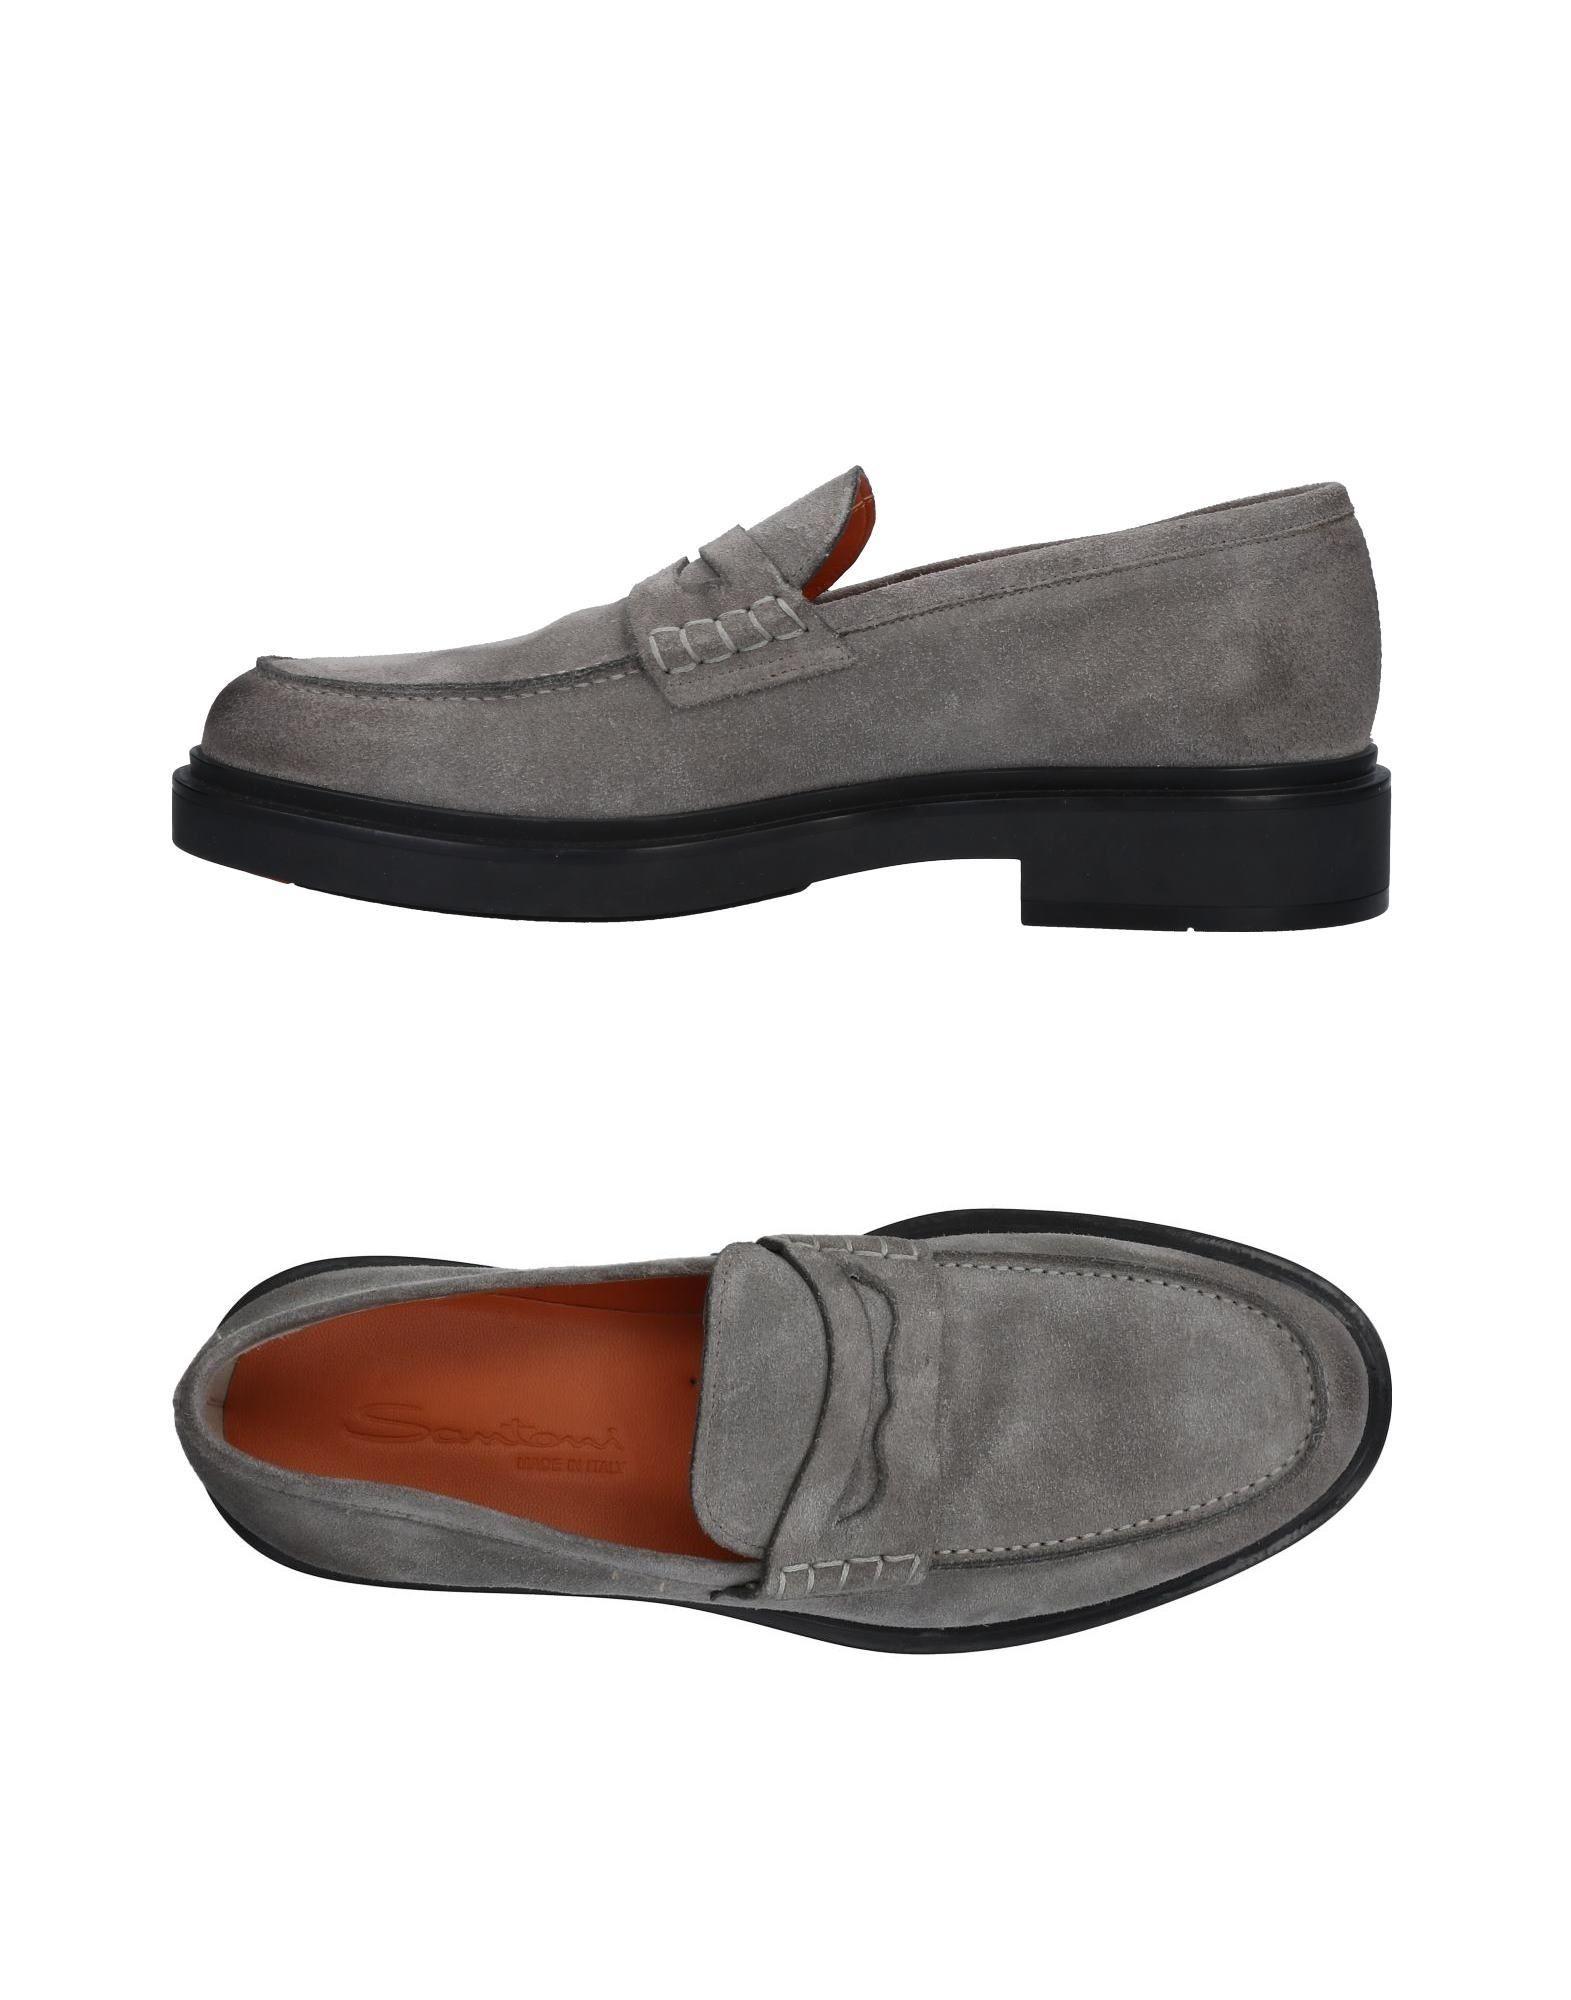 Santoni Mokassins Herren  11479520XI Gute Qualität beliebte Schuhe